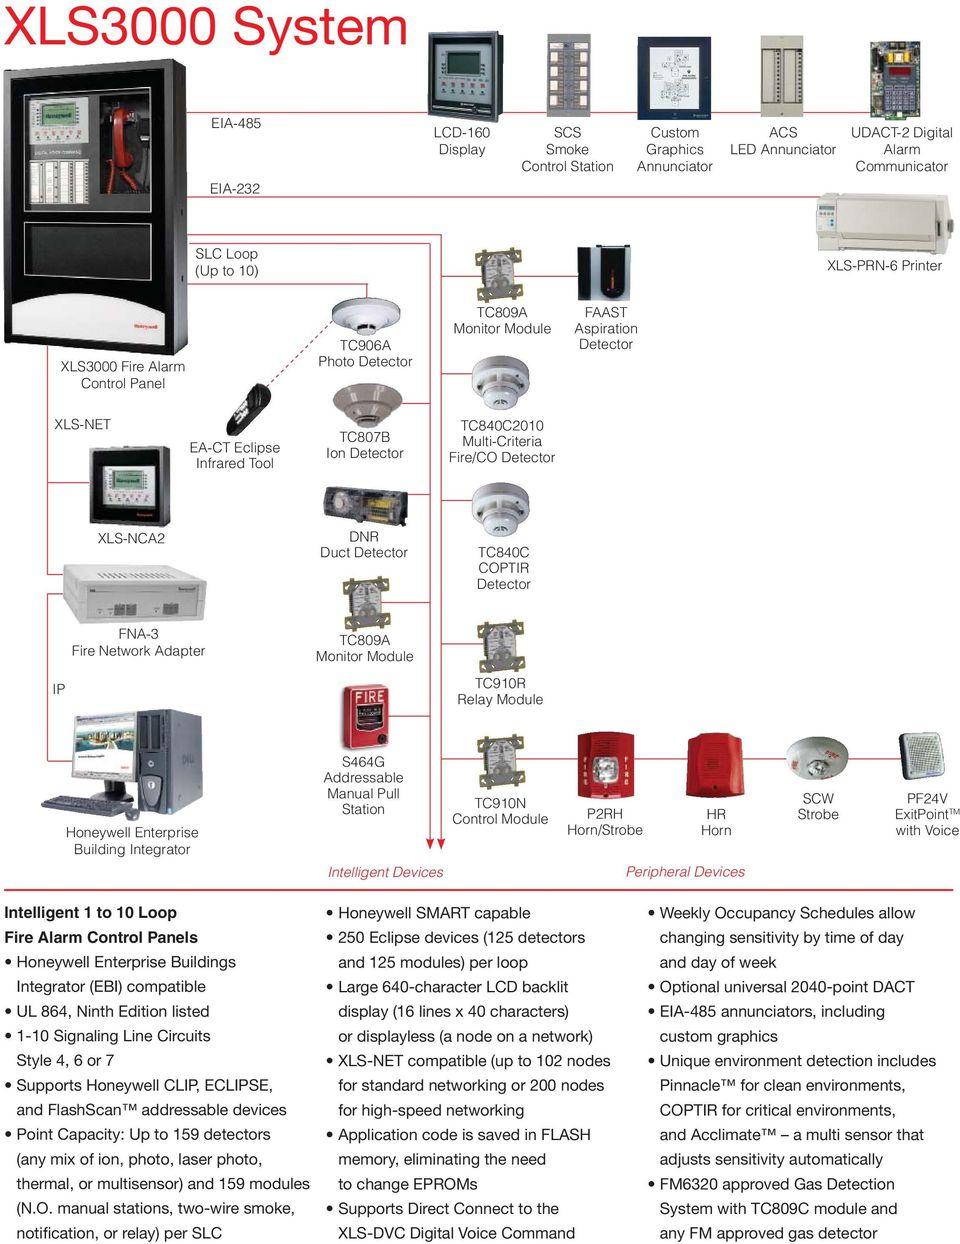 hight resolution of network adapter tc809a tc910r relay module honeywell enterprise building integrator s464g addressable manual pull station intelligent